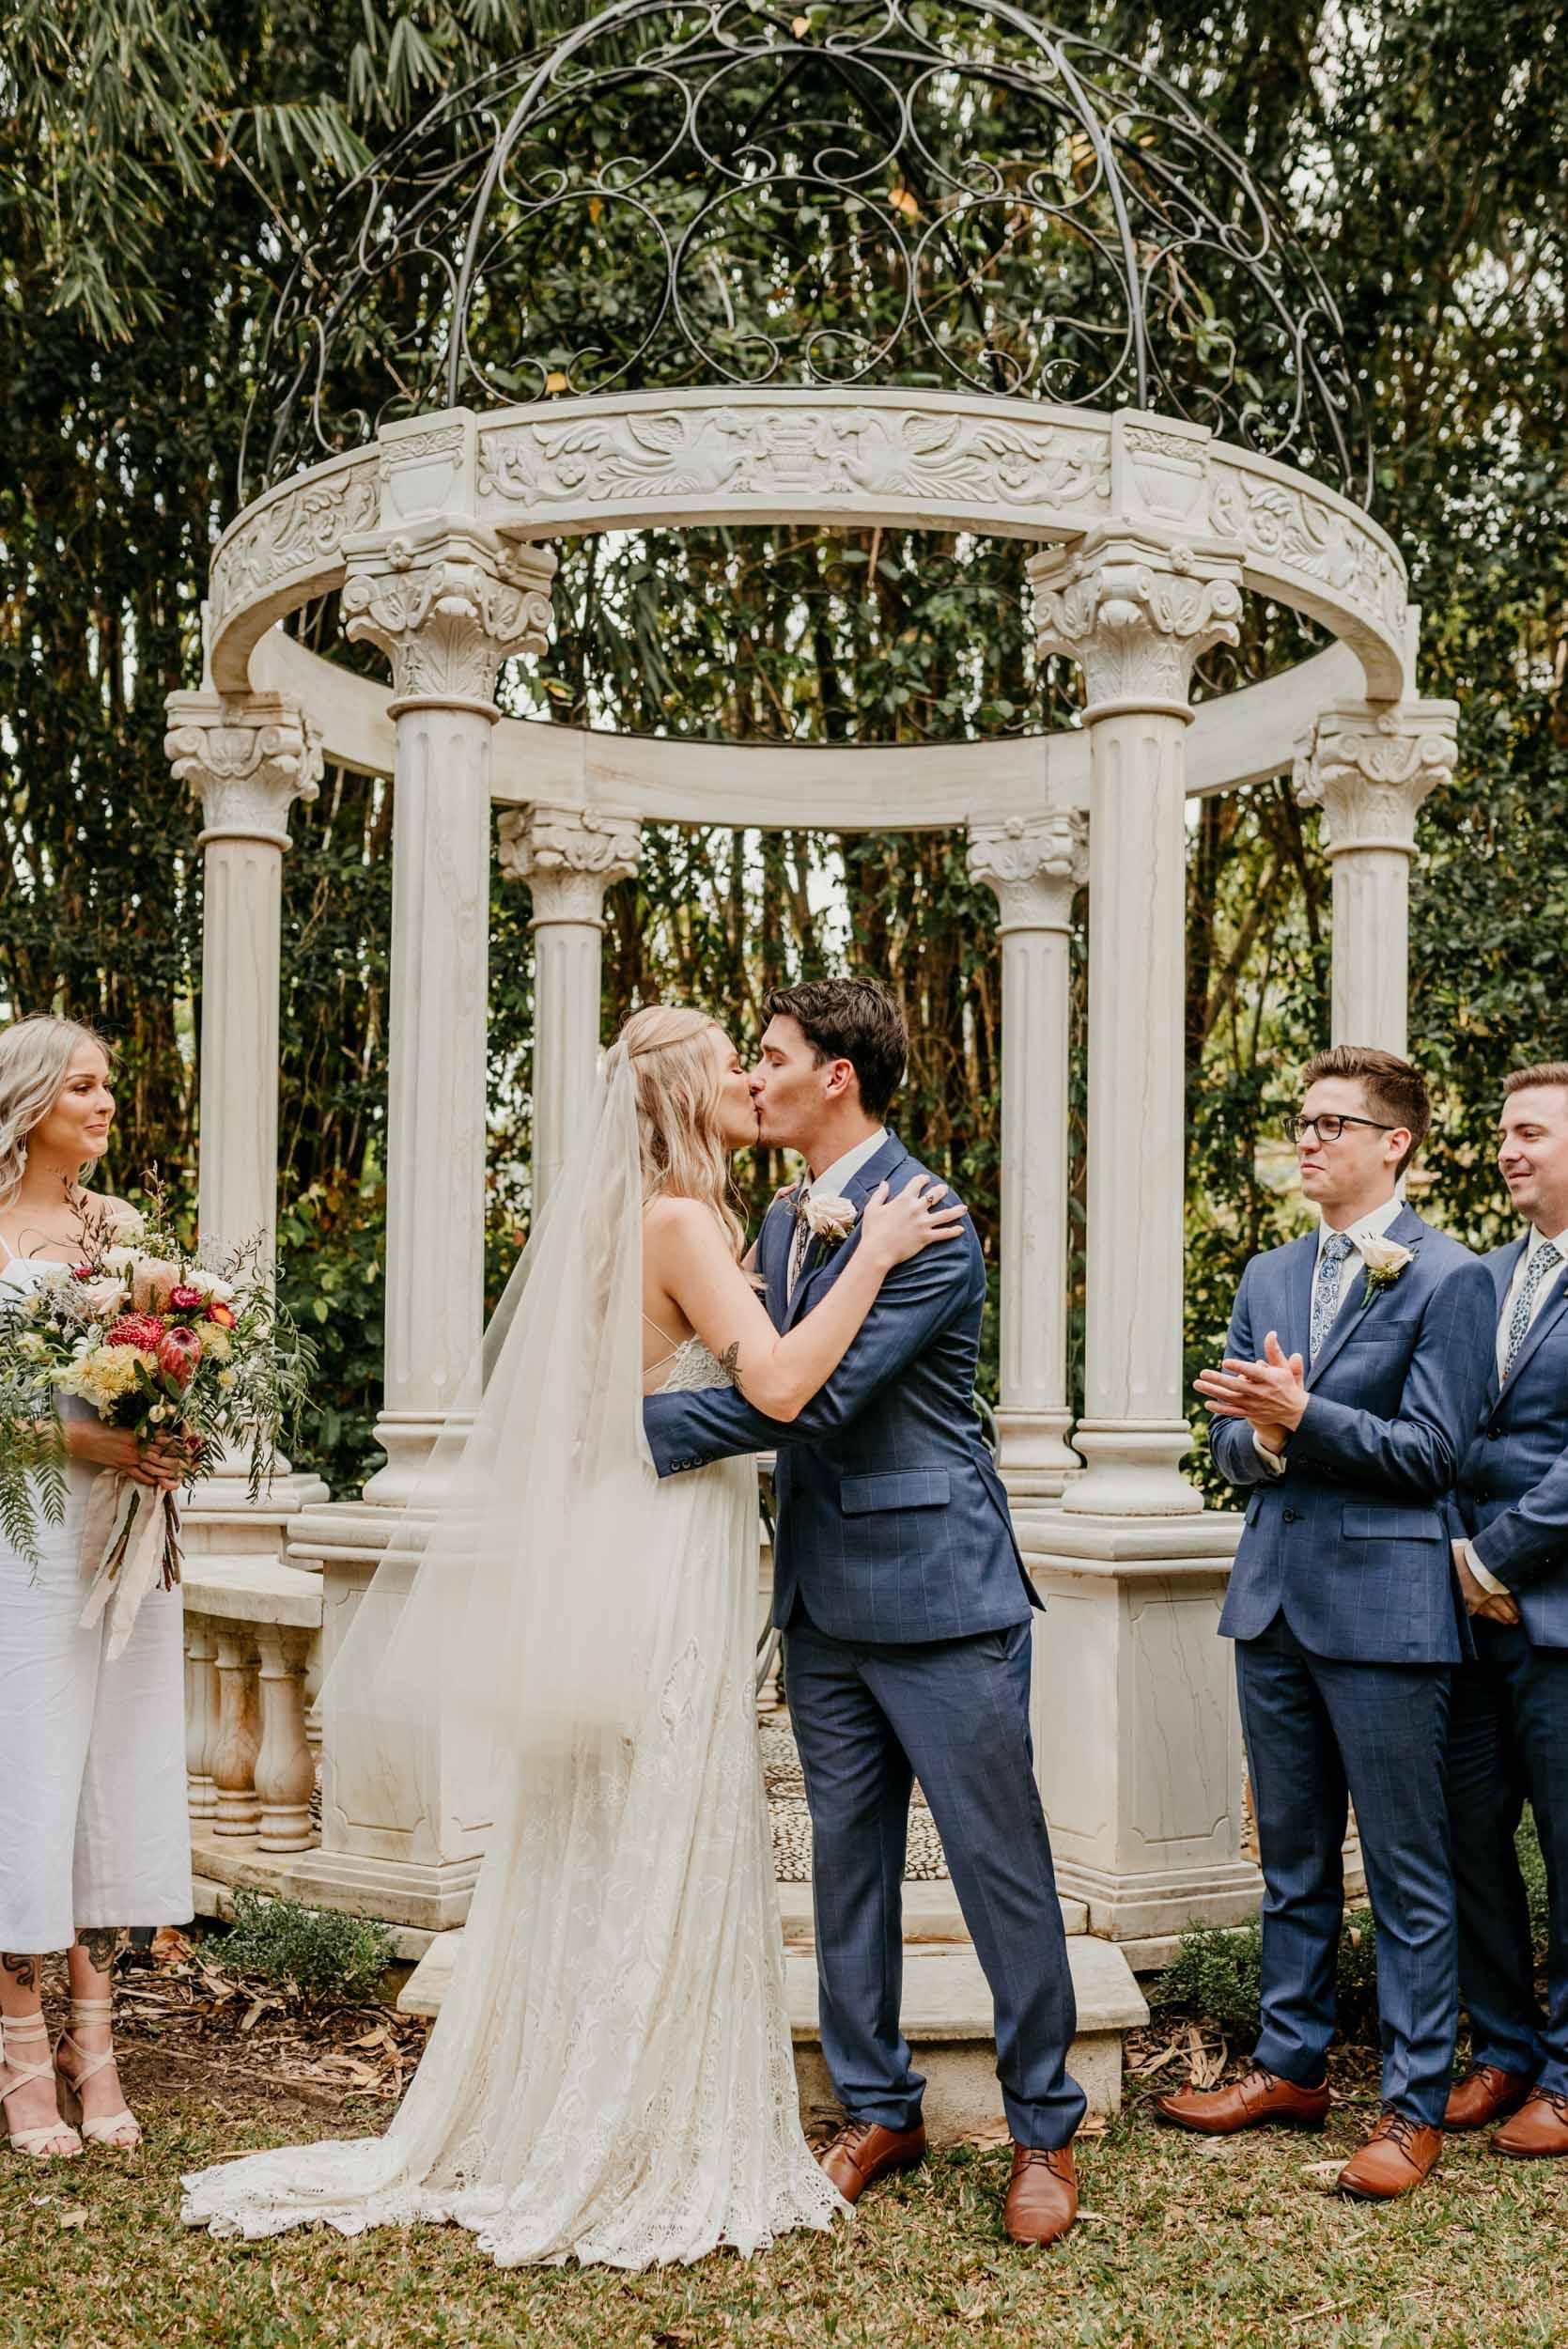 The Raw Photographer - Cairns Wedding Photographer - Laloli - Cairns Garden Wedding - Wedding Dress-46.jpg